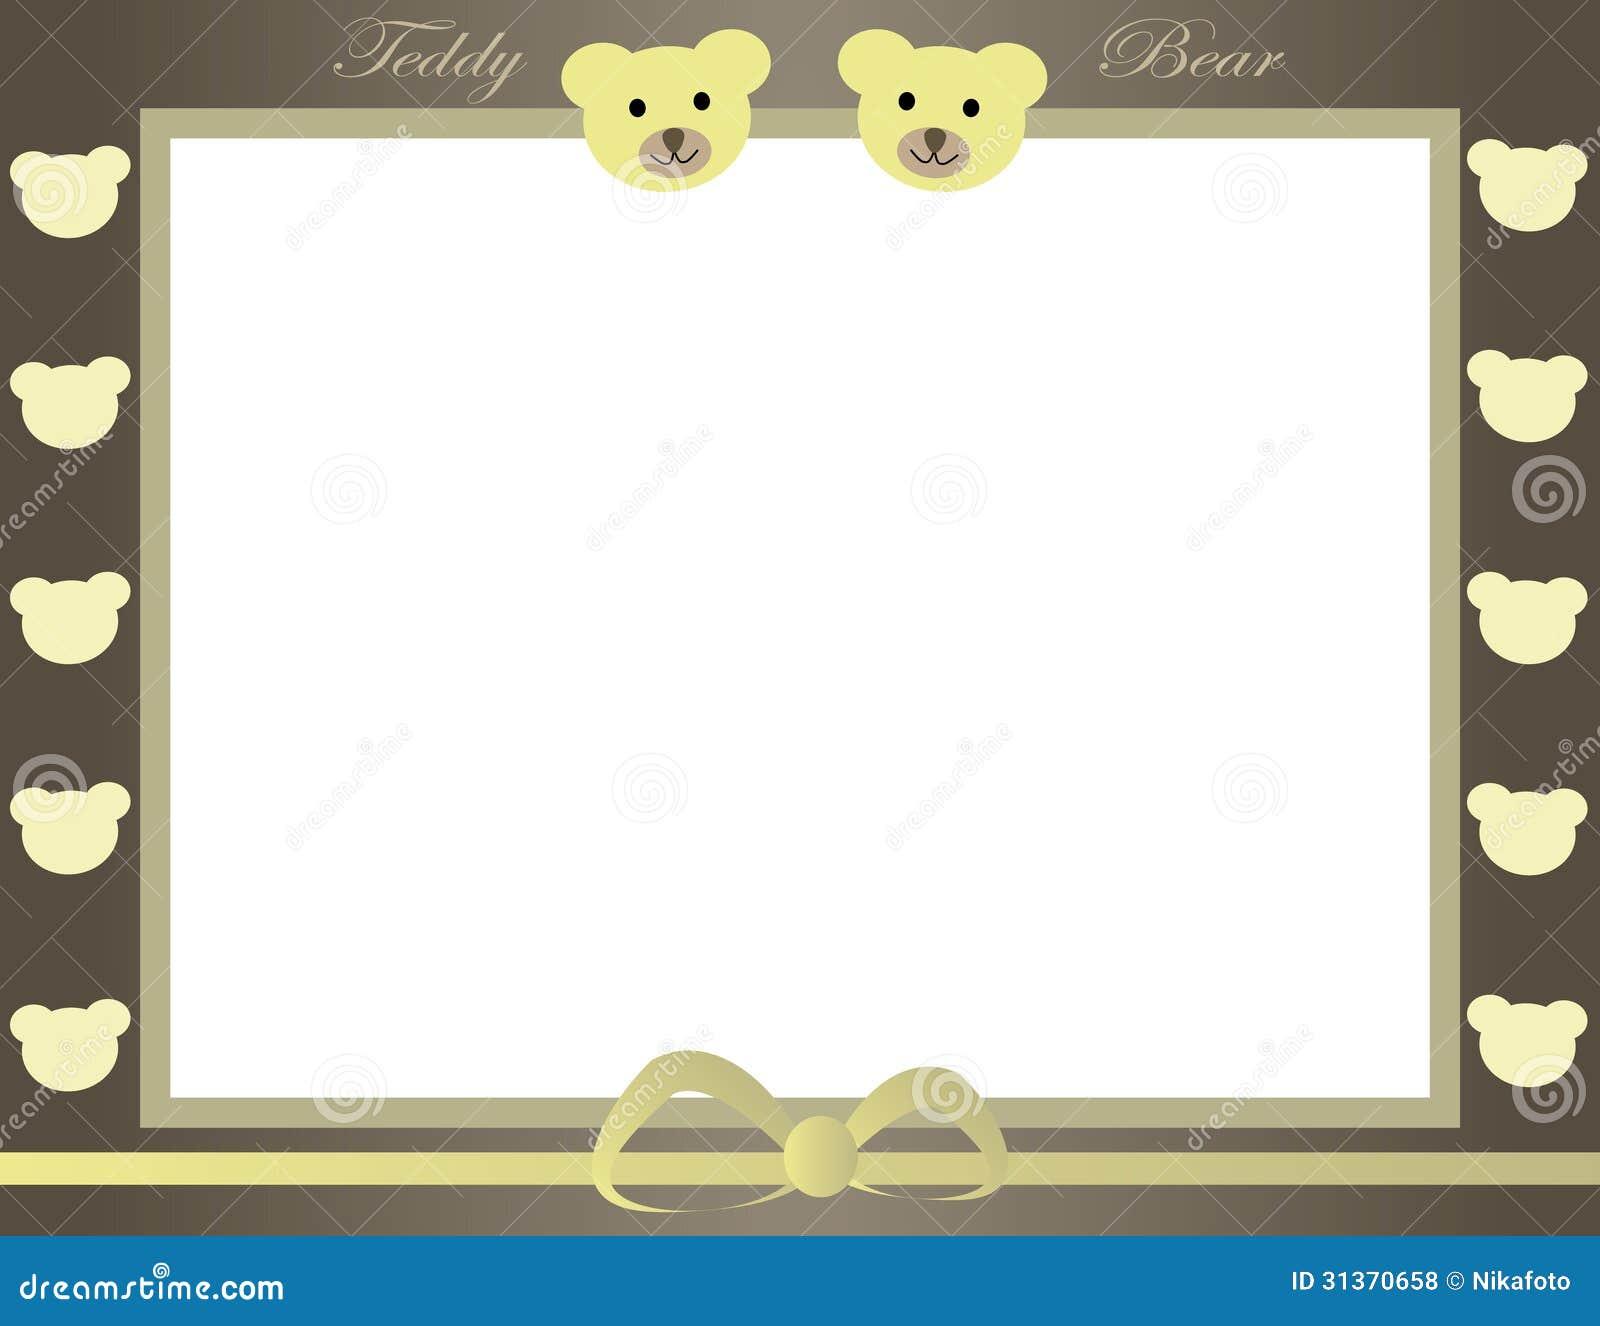 Teddy bear frame stock vector. Illustration of deliver - 31370658